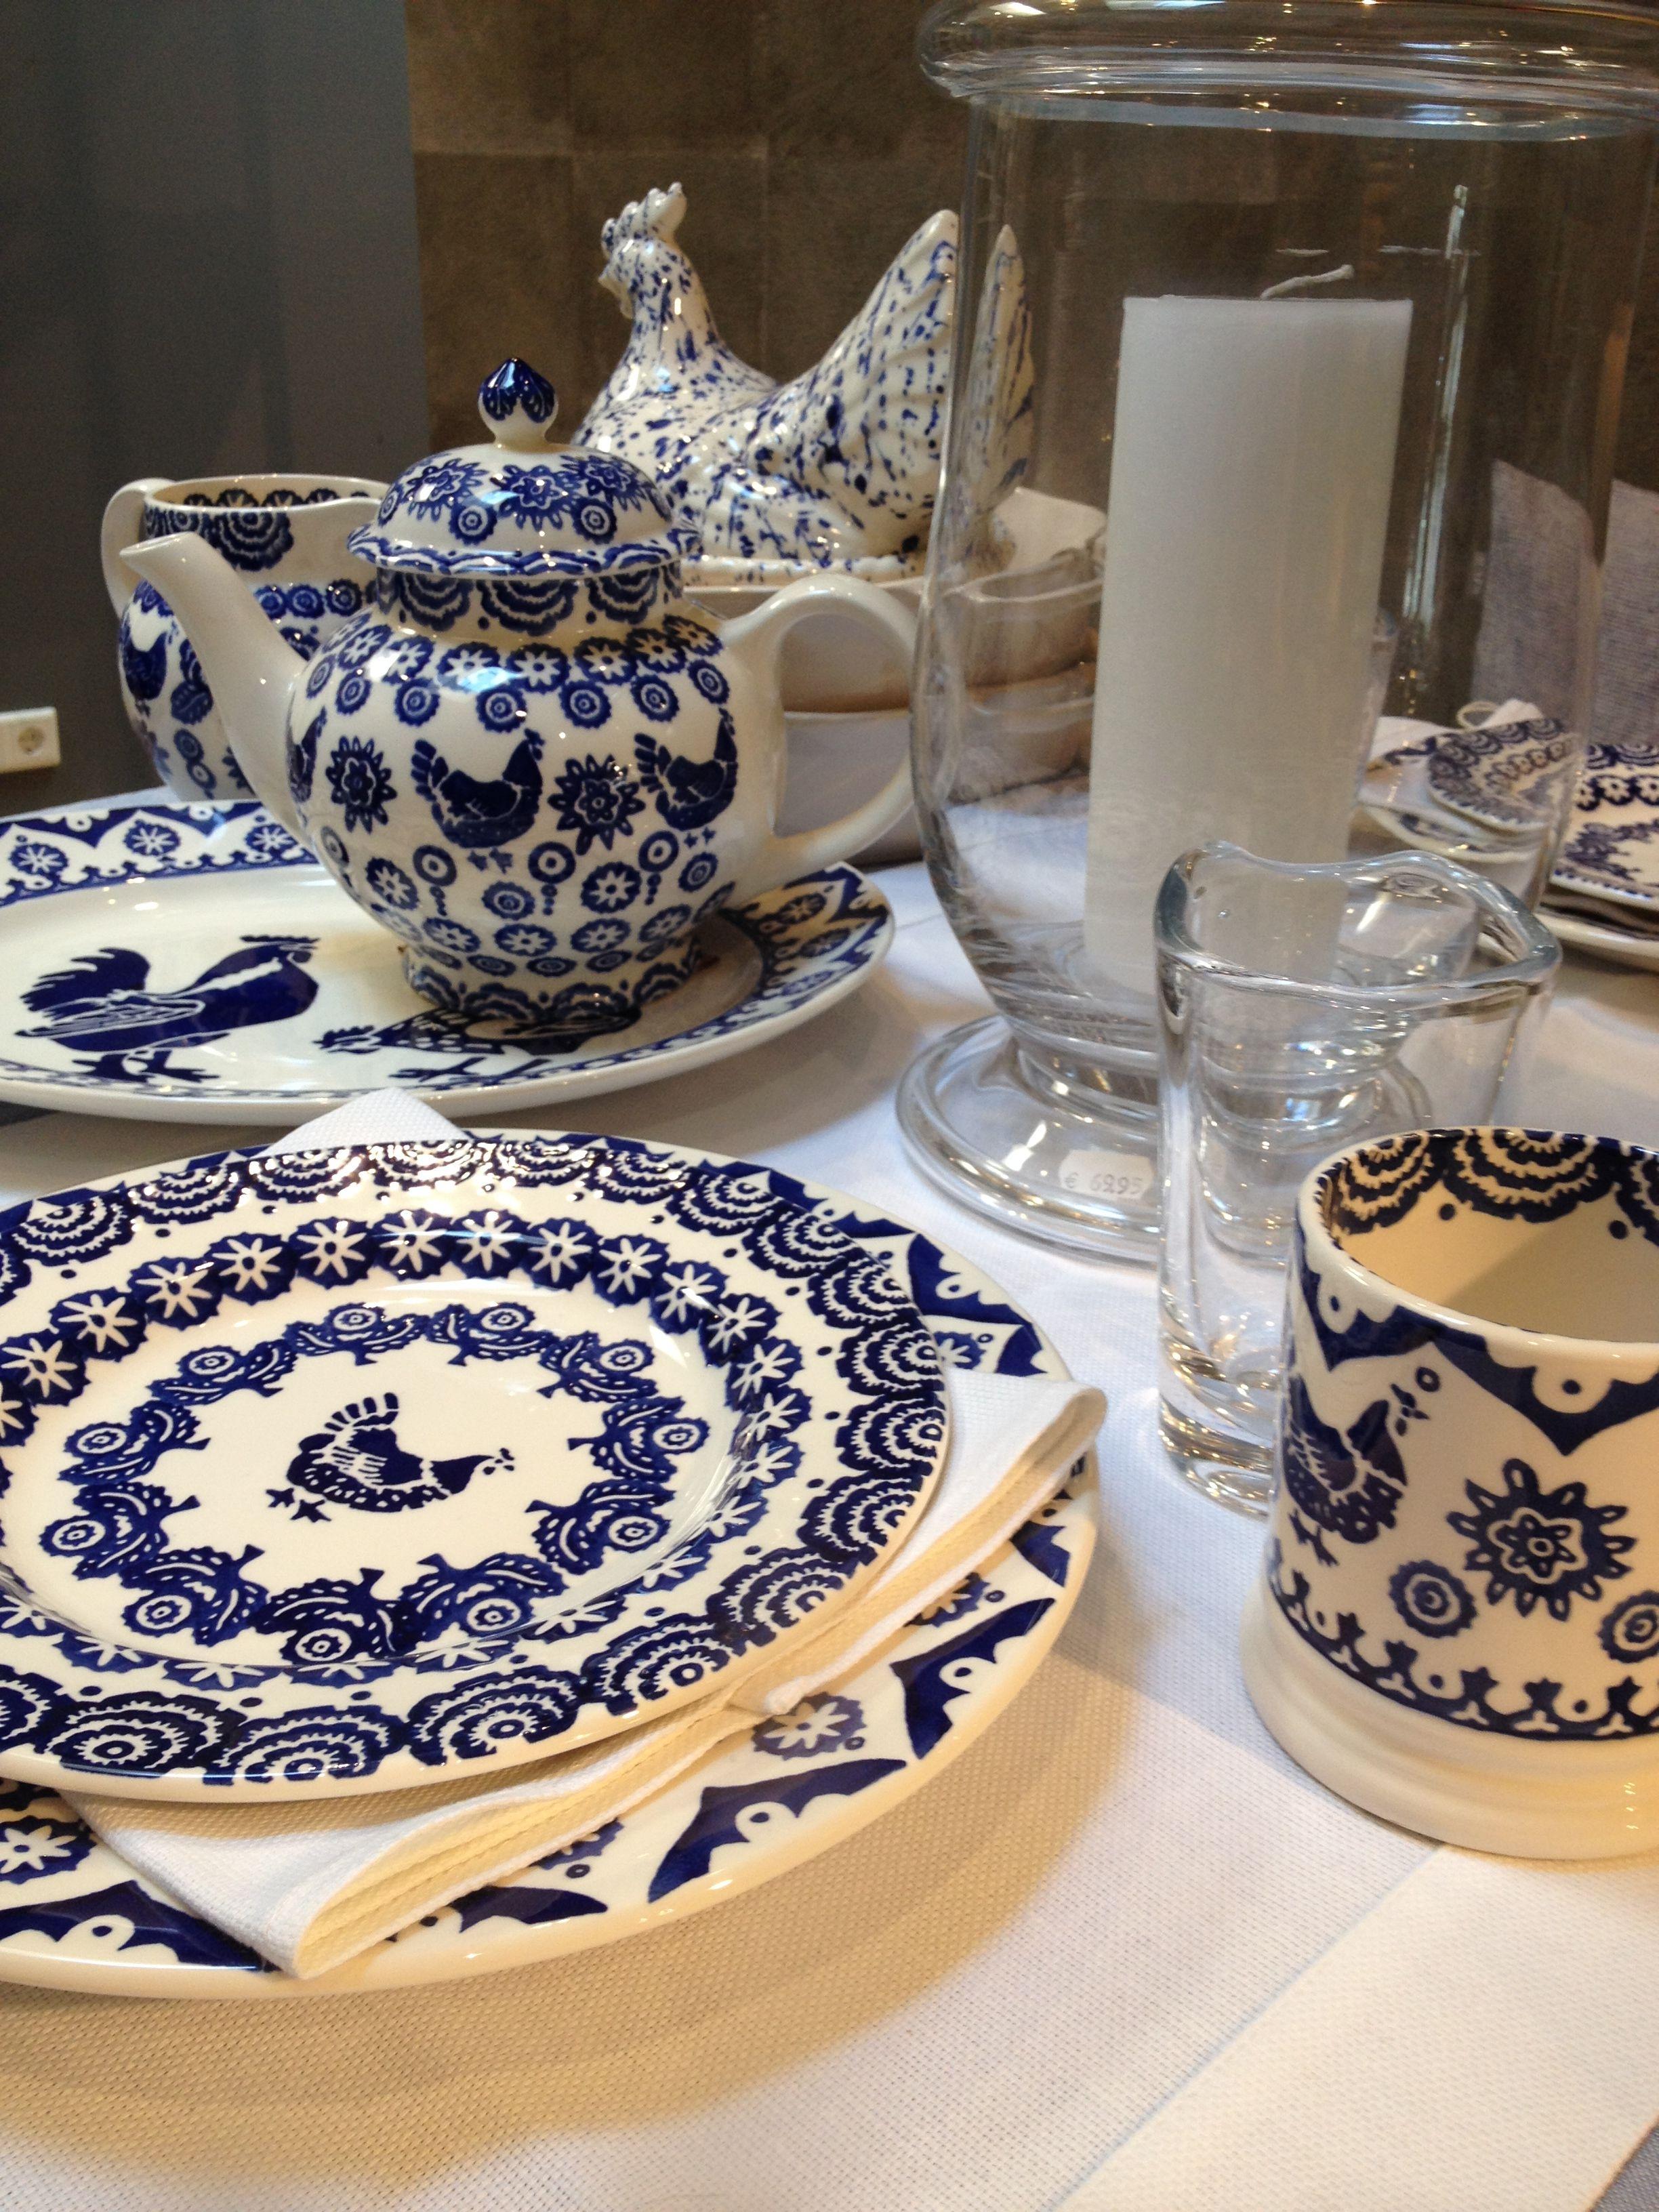 Emma Bridgewater Blue Hen & Border, Splatter Hen on Nest, Scapa Home textiles, Flamant glass www.byhedges.nl